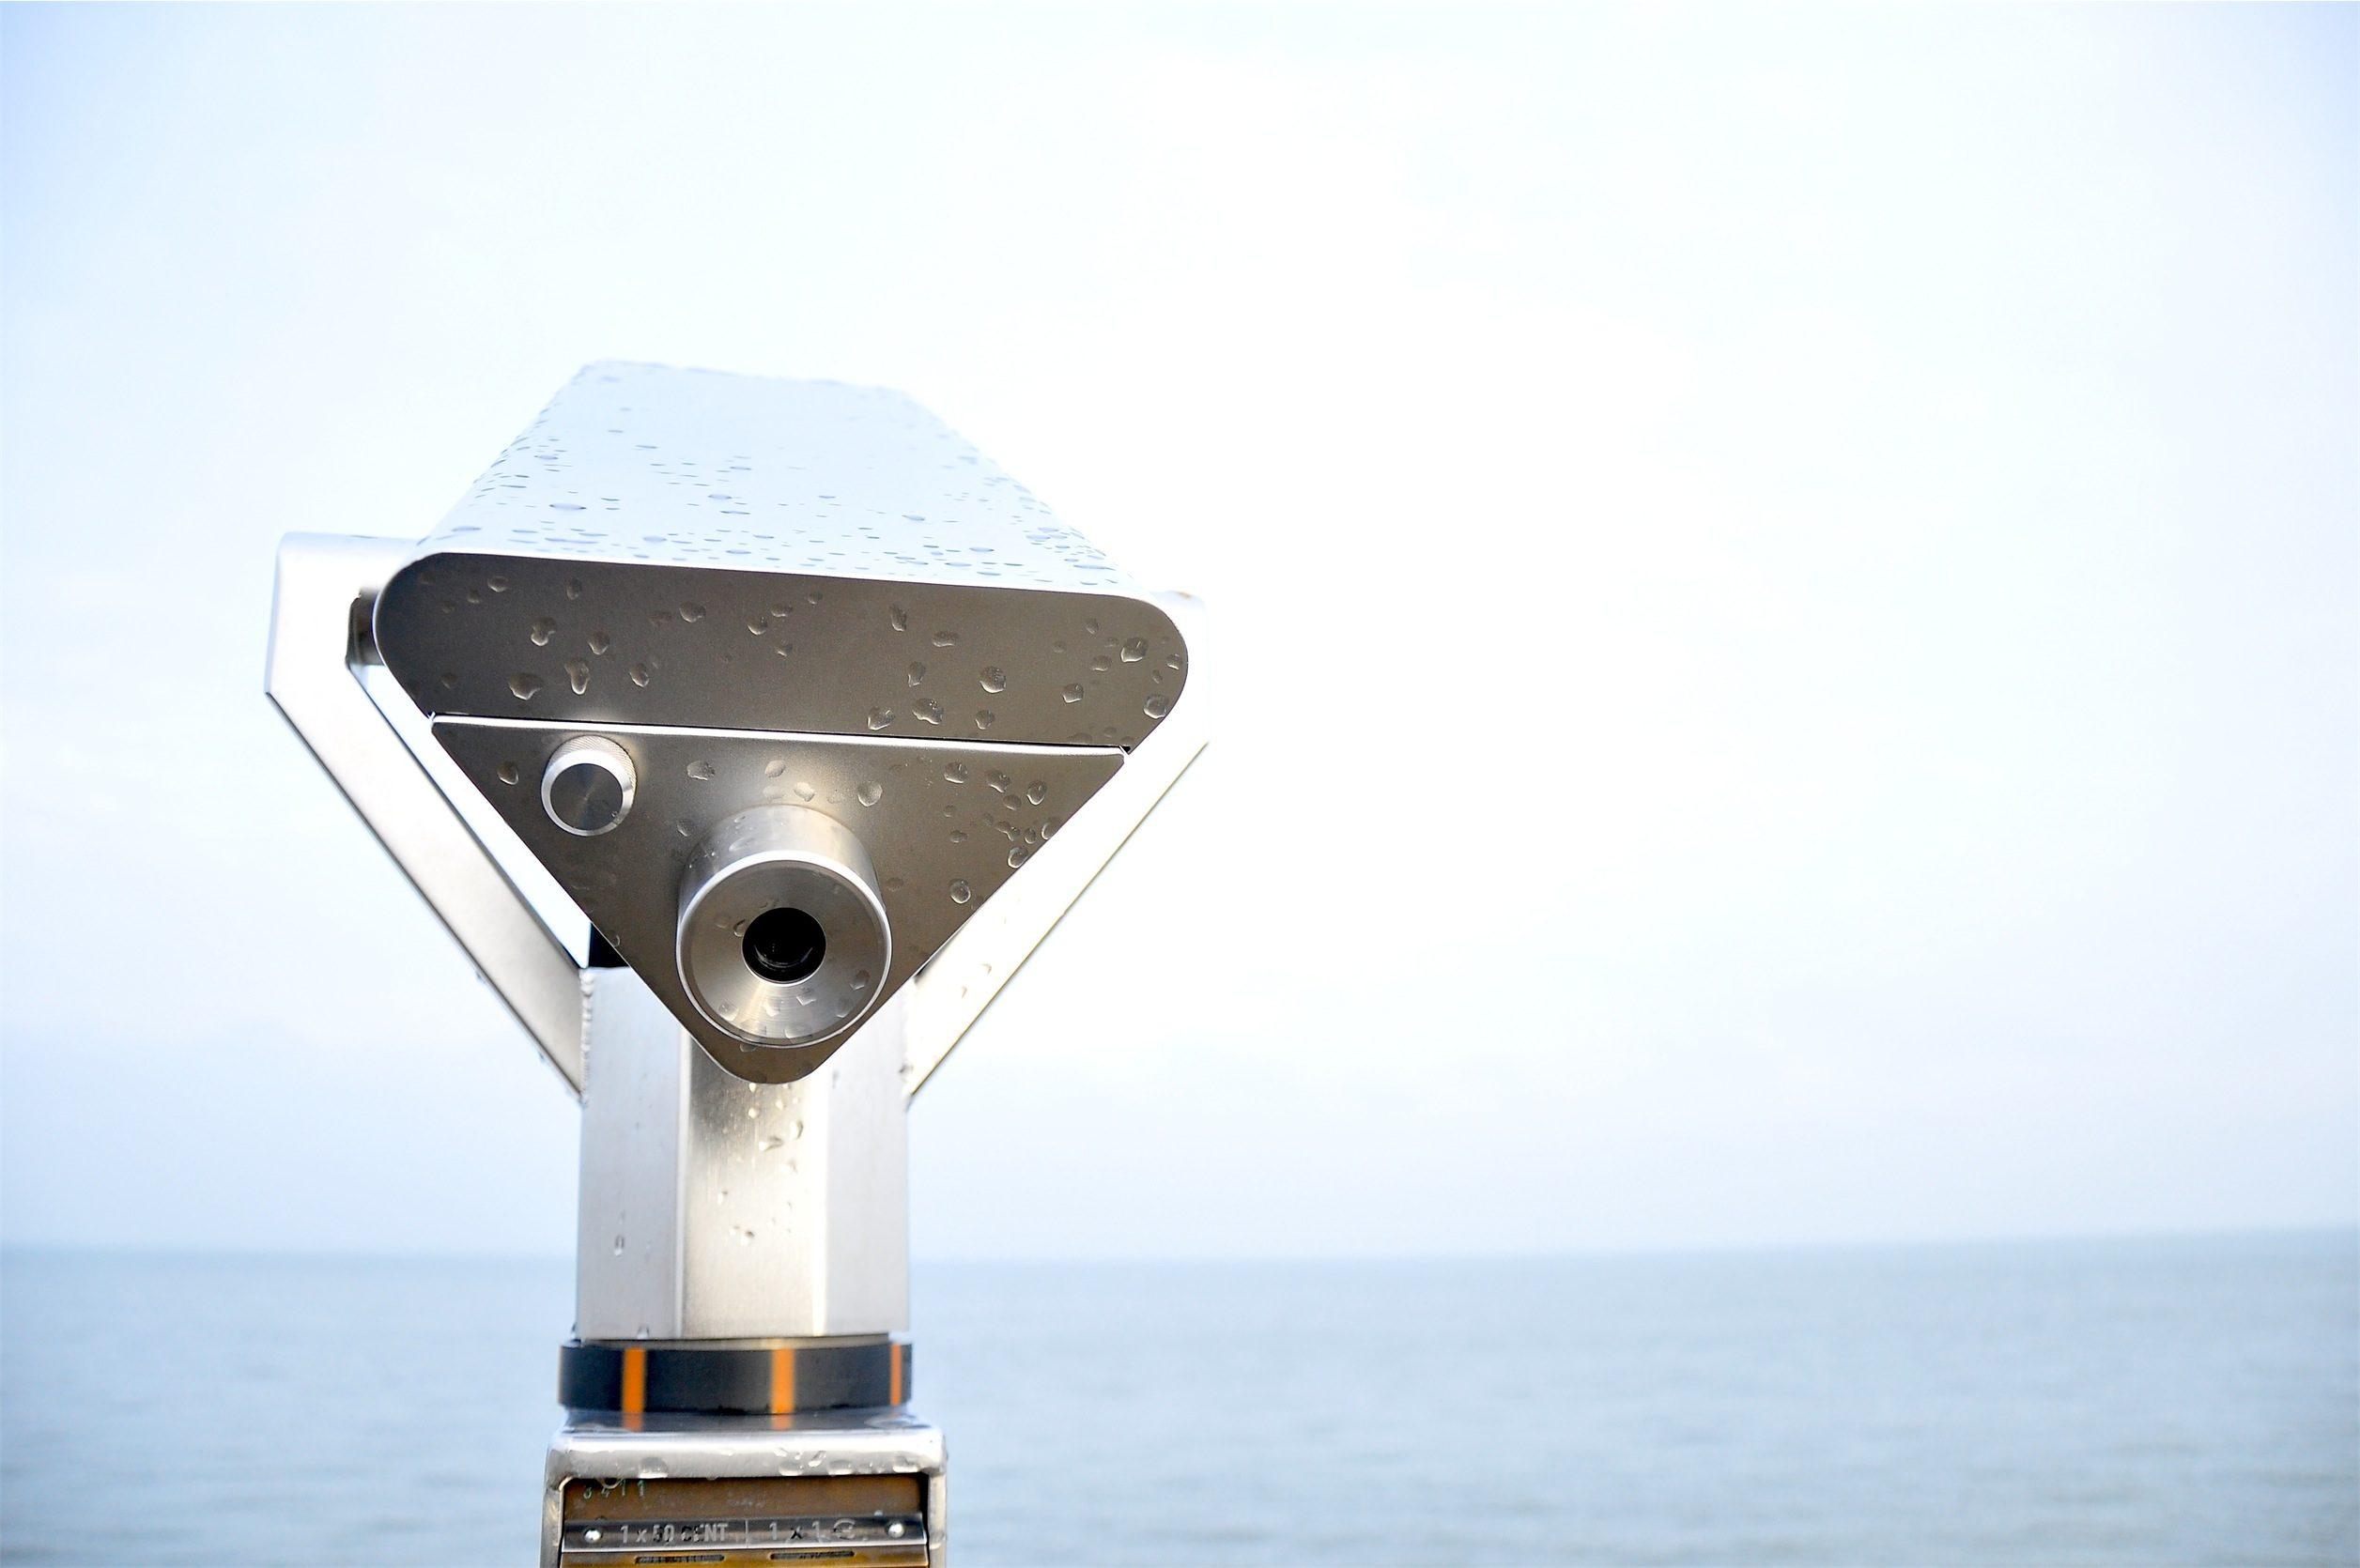 Mirador, binocolo, paesaggio, Mare, acqua - Sfondi HD - Professor-falken.com